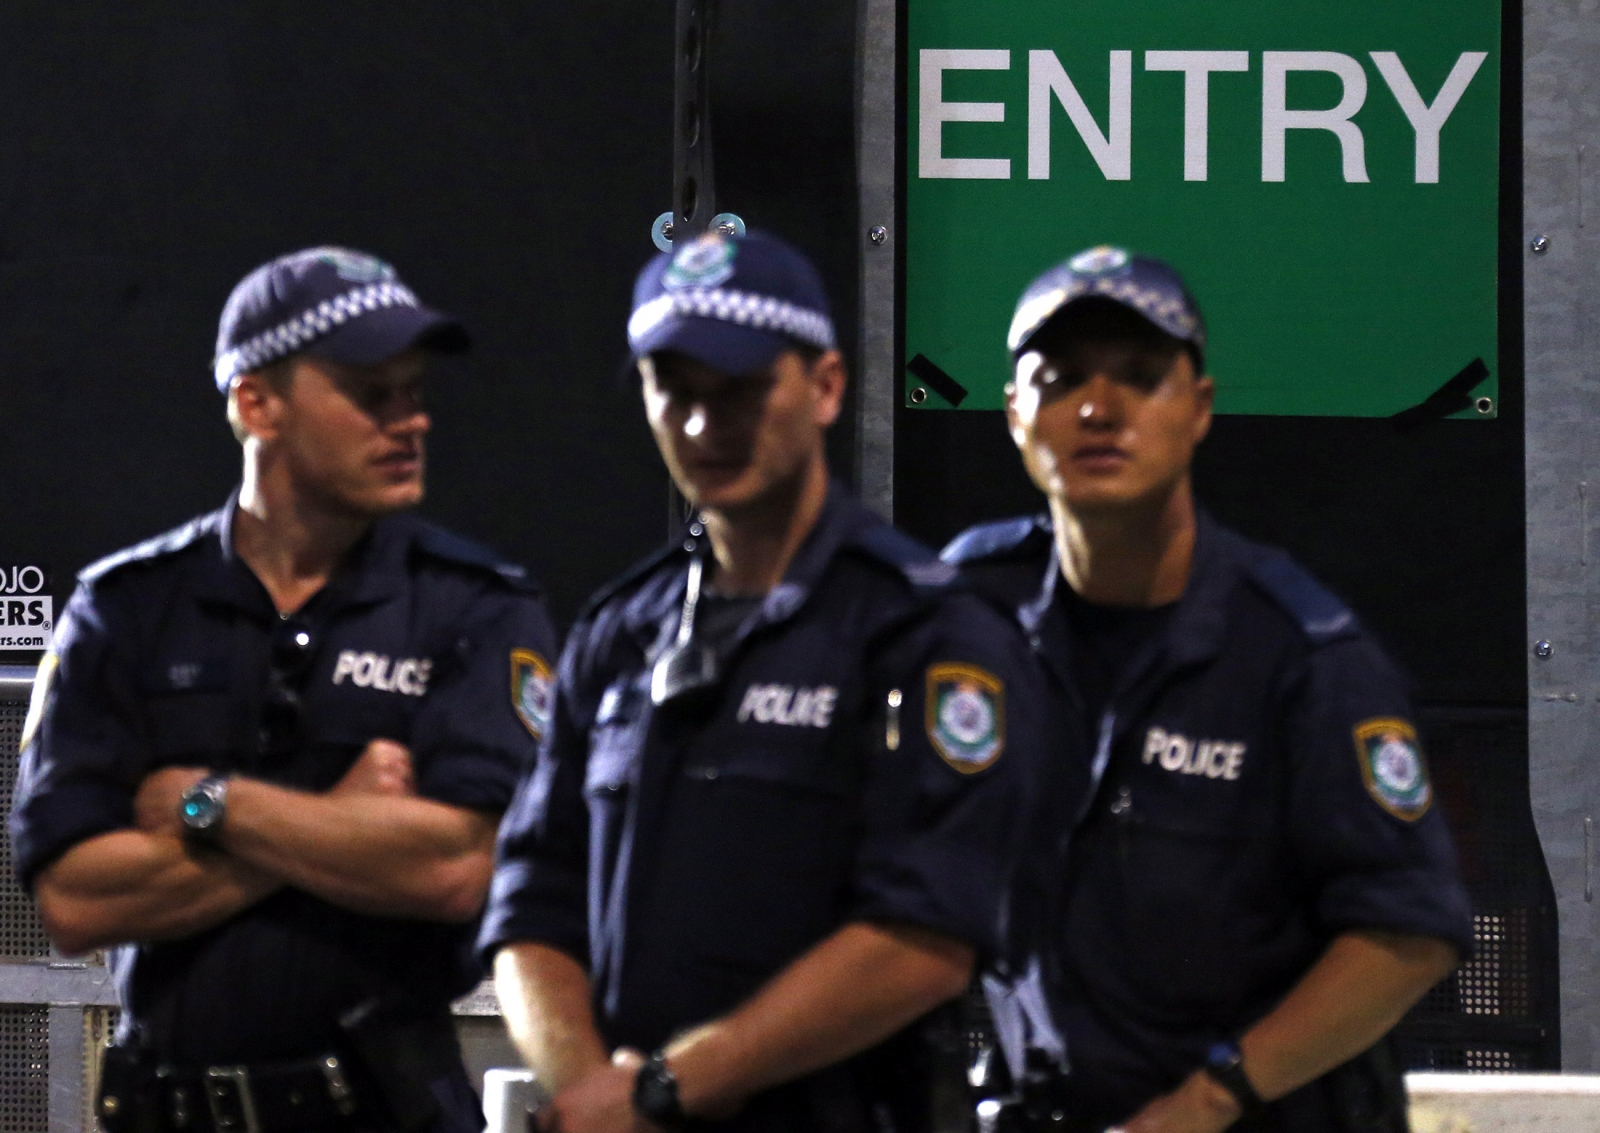 Violent brawl in Queensland